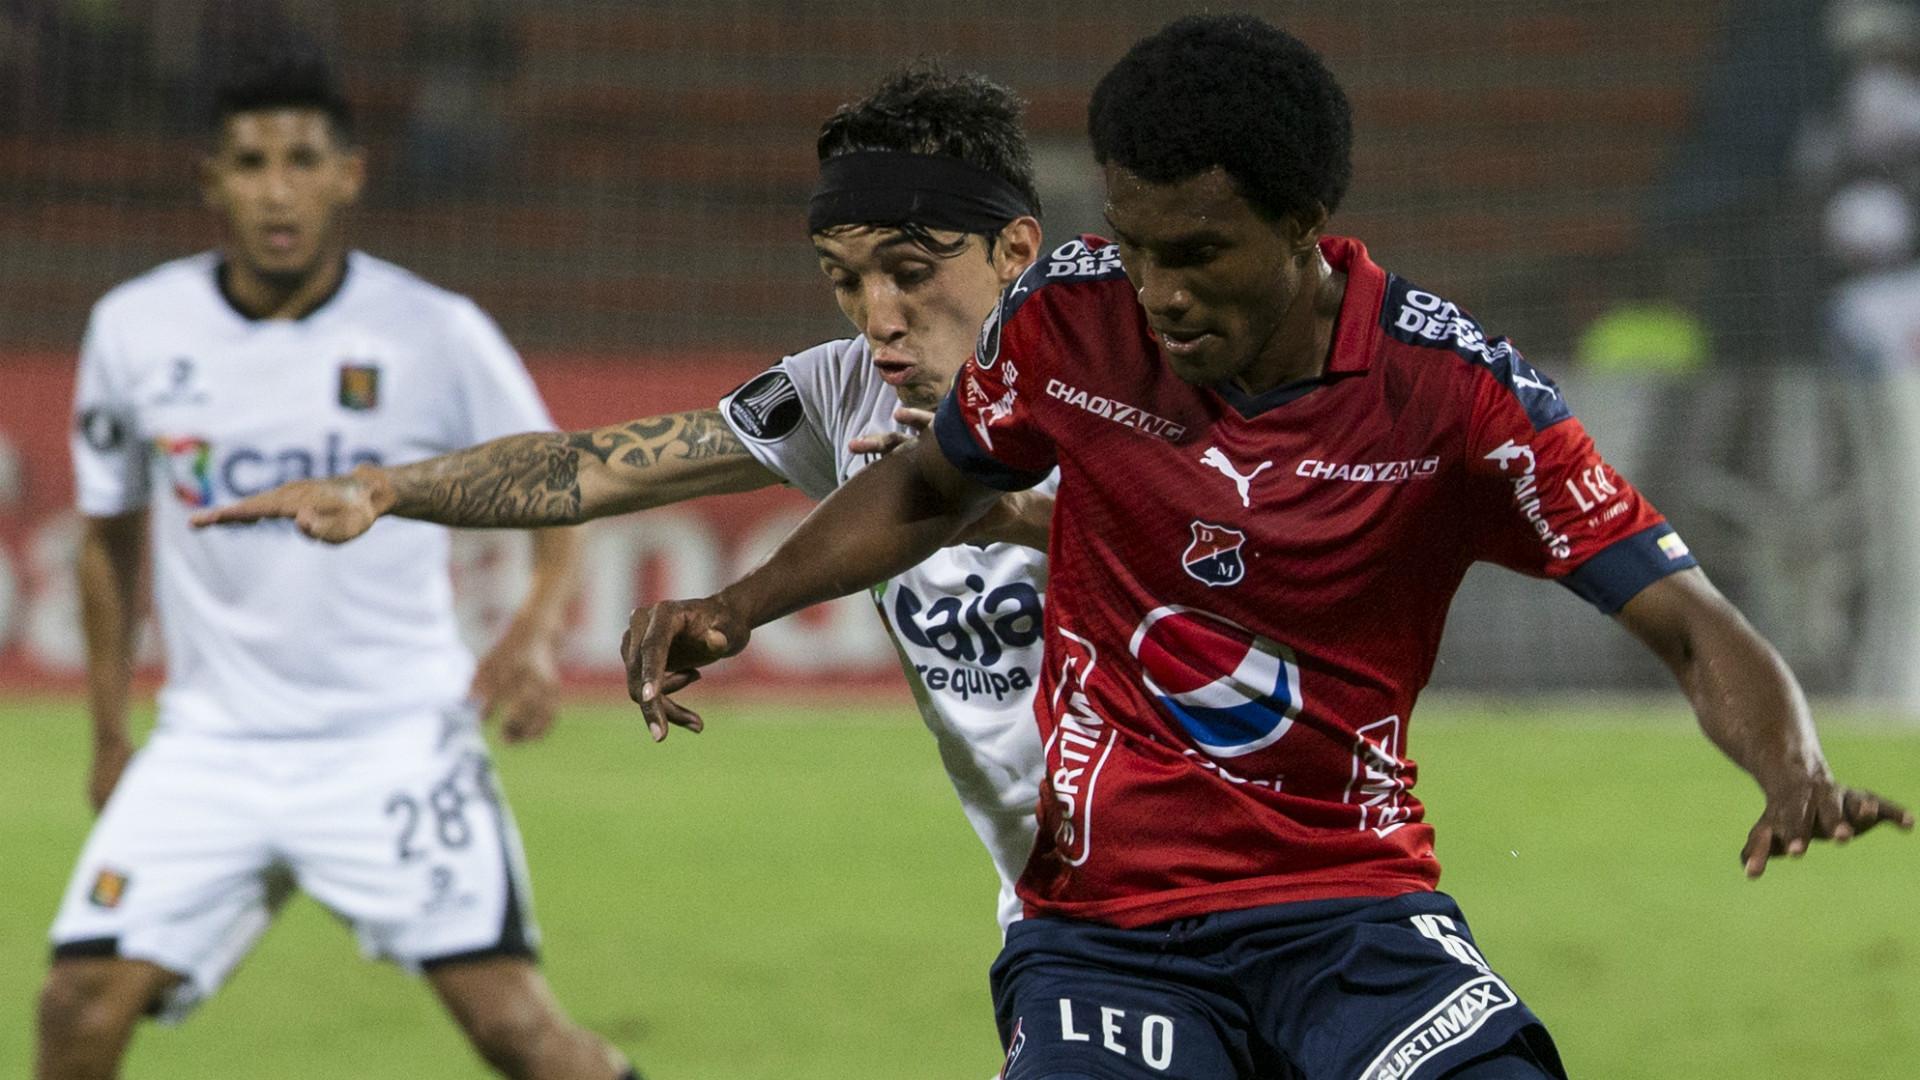 Didier Moreno DIM Copa Libertadores 2017